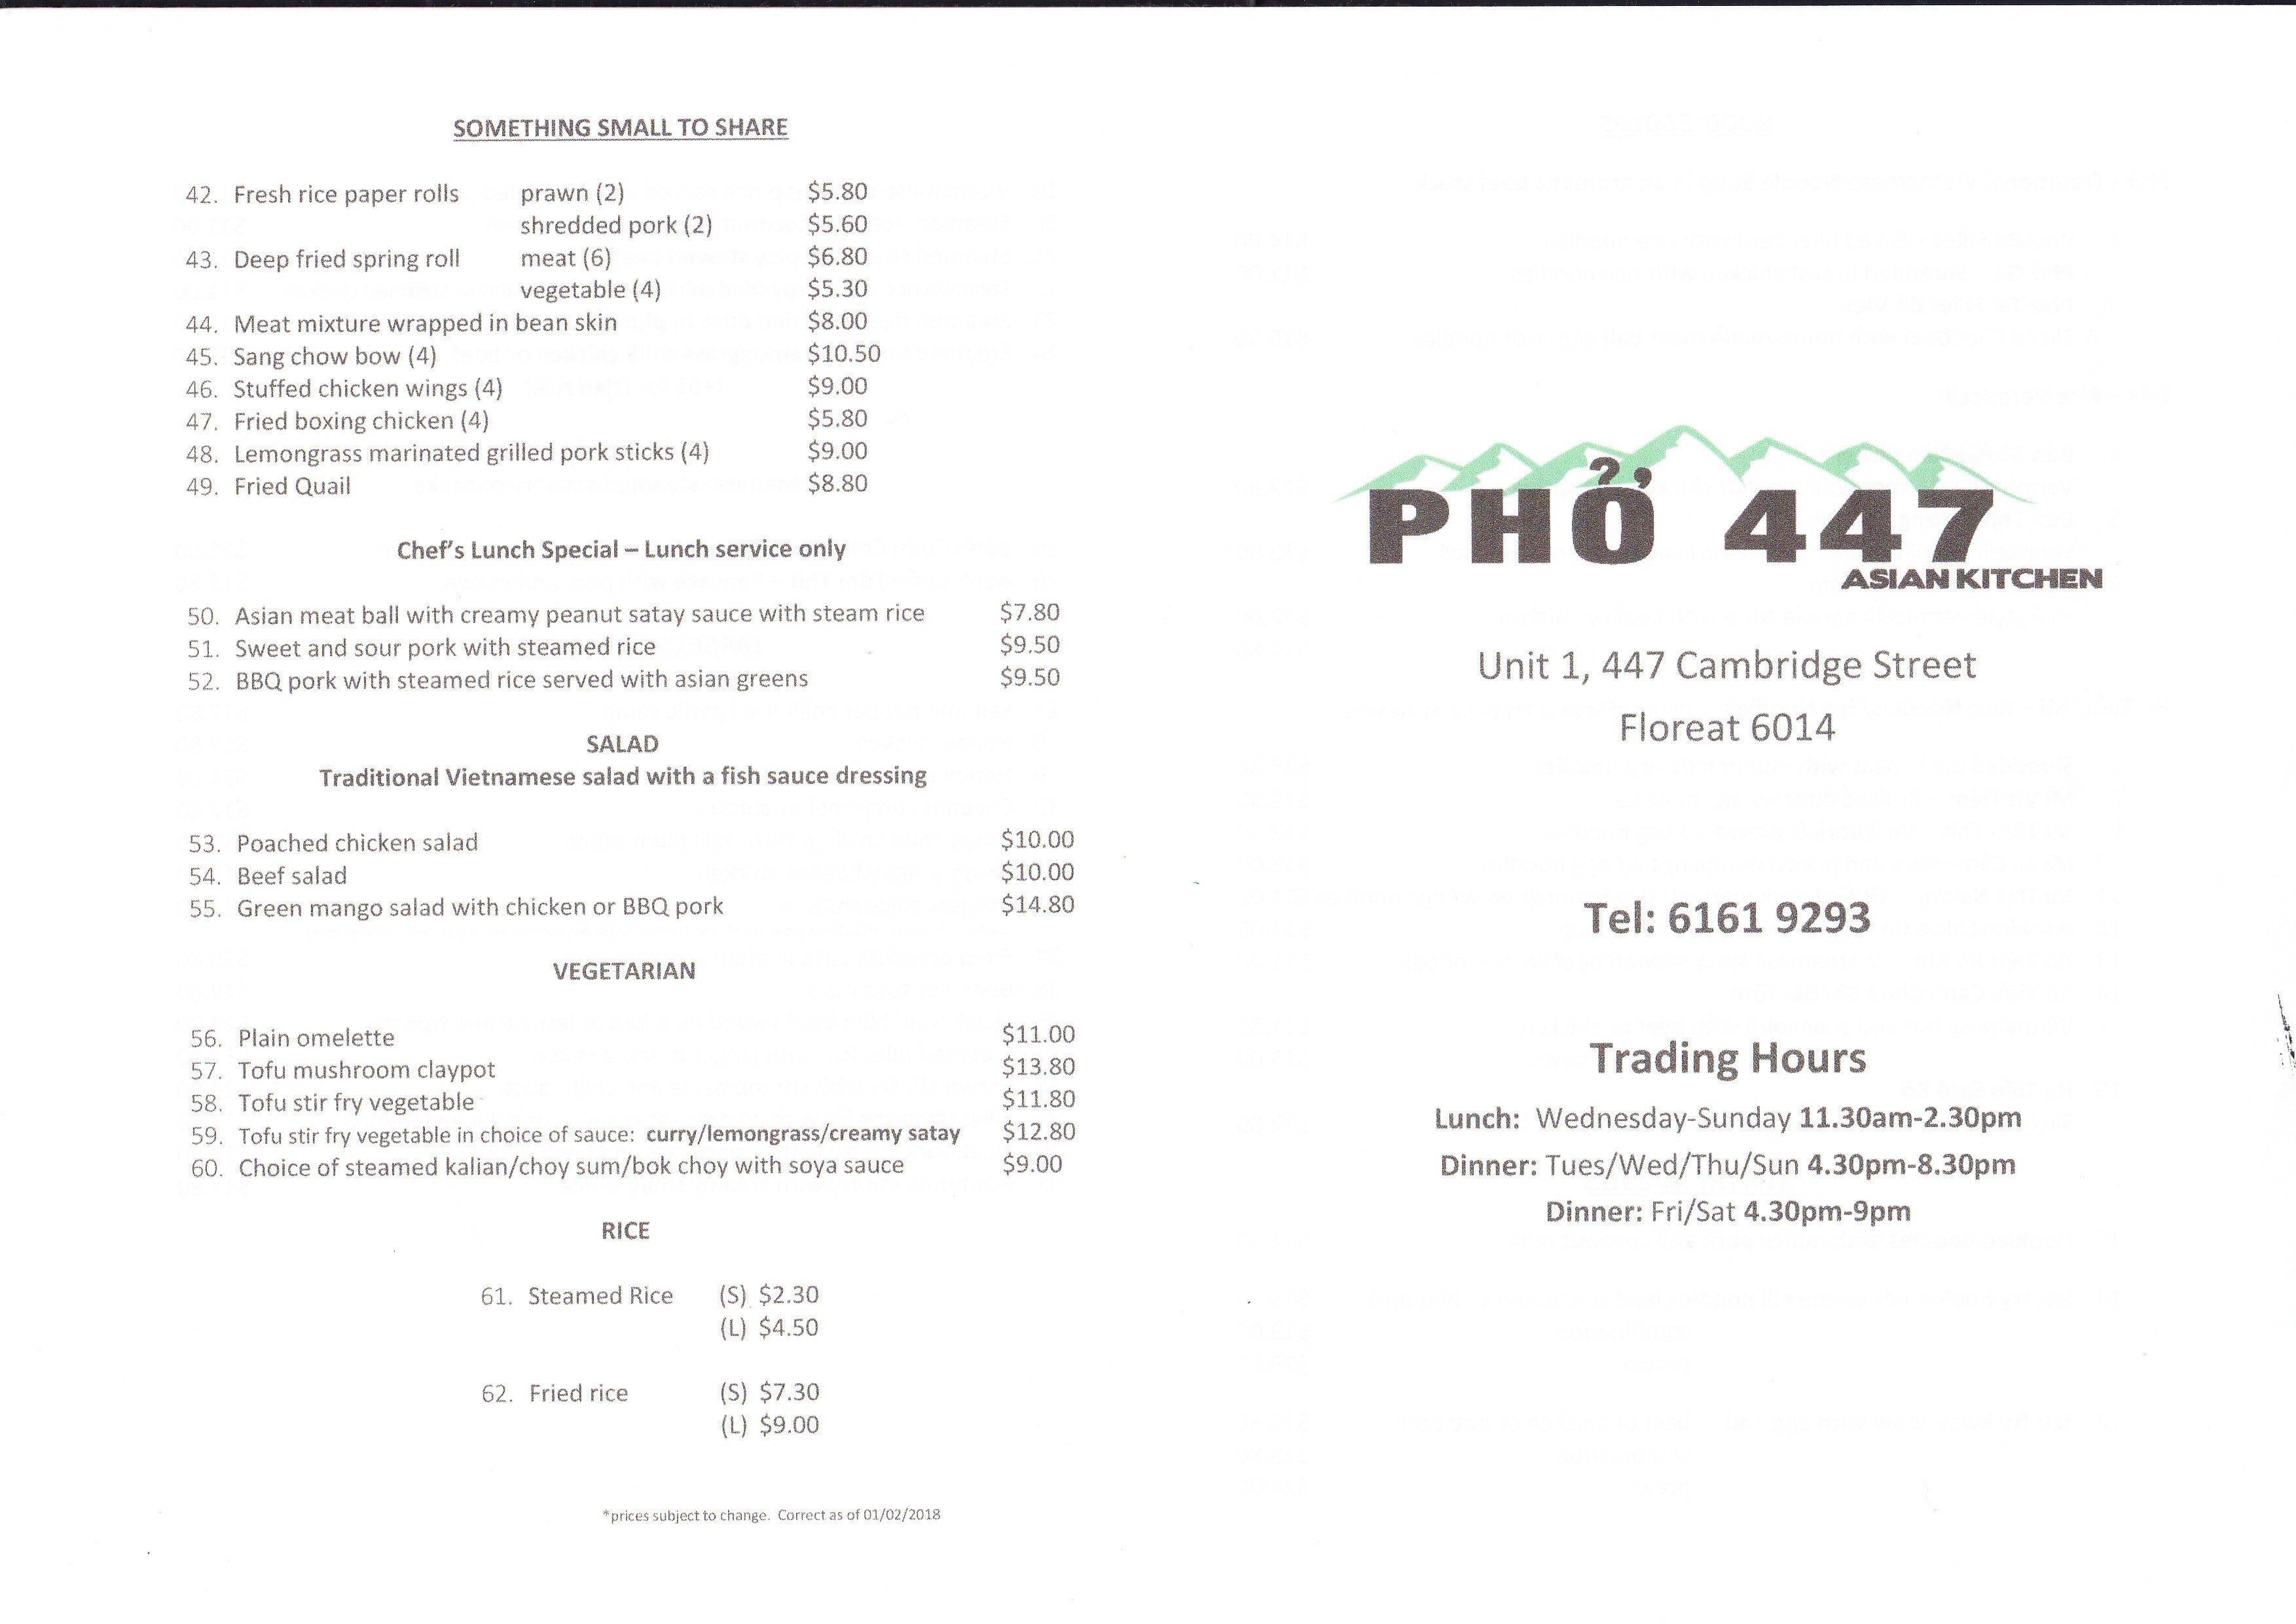 Pho 447 Asian Kitchen Menu, Menu for Pho 447 Asian Kitchen, Floreat ...